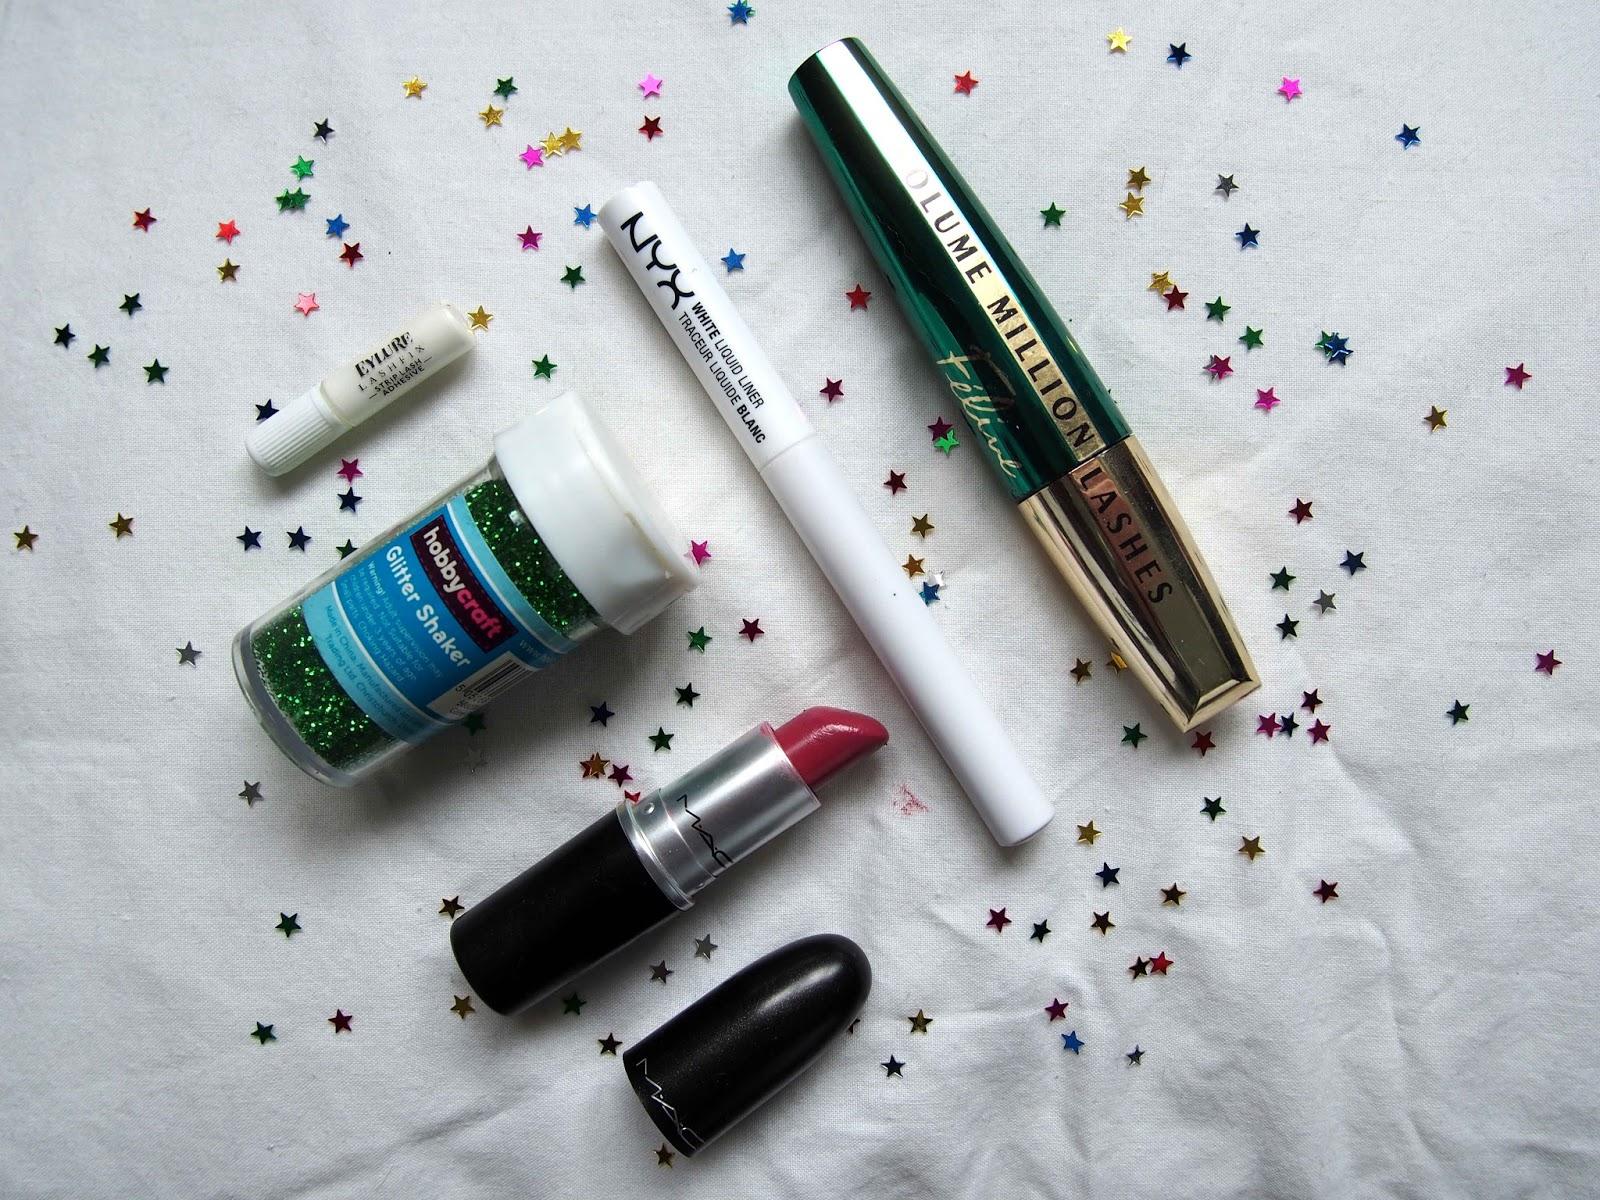 festival bestival the future makeup, festival glitter star sequin makeup, white eyeliner, space sci fi alien makeup 4